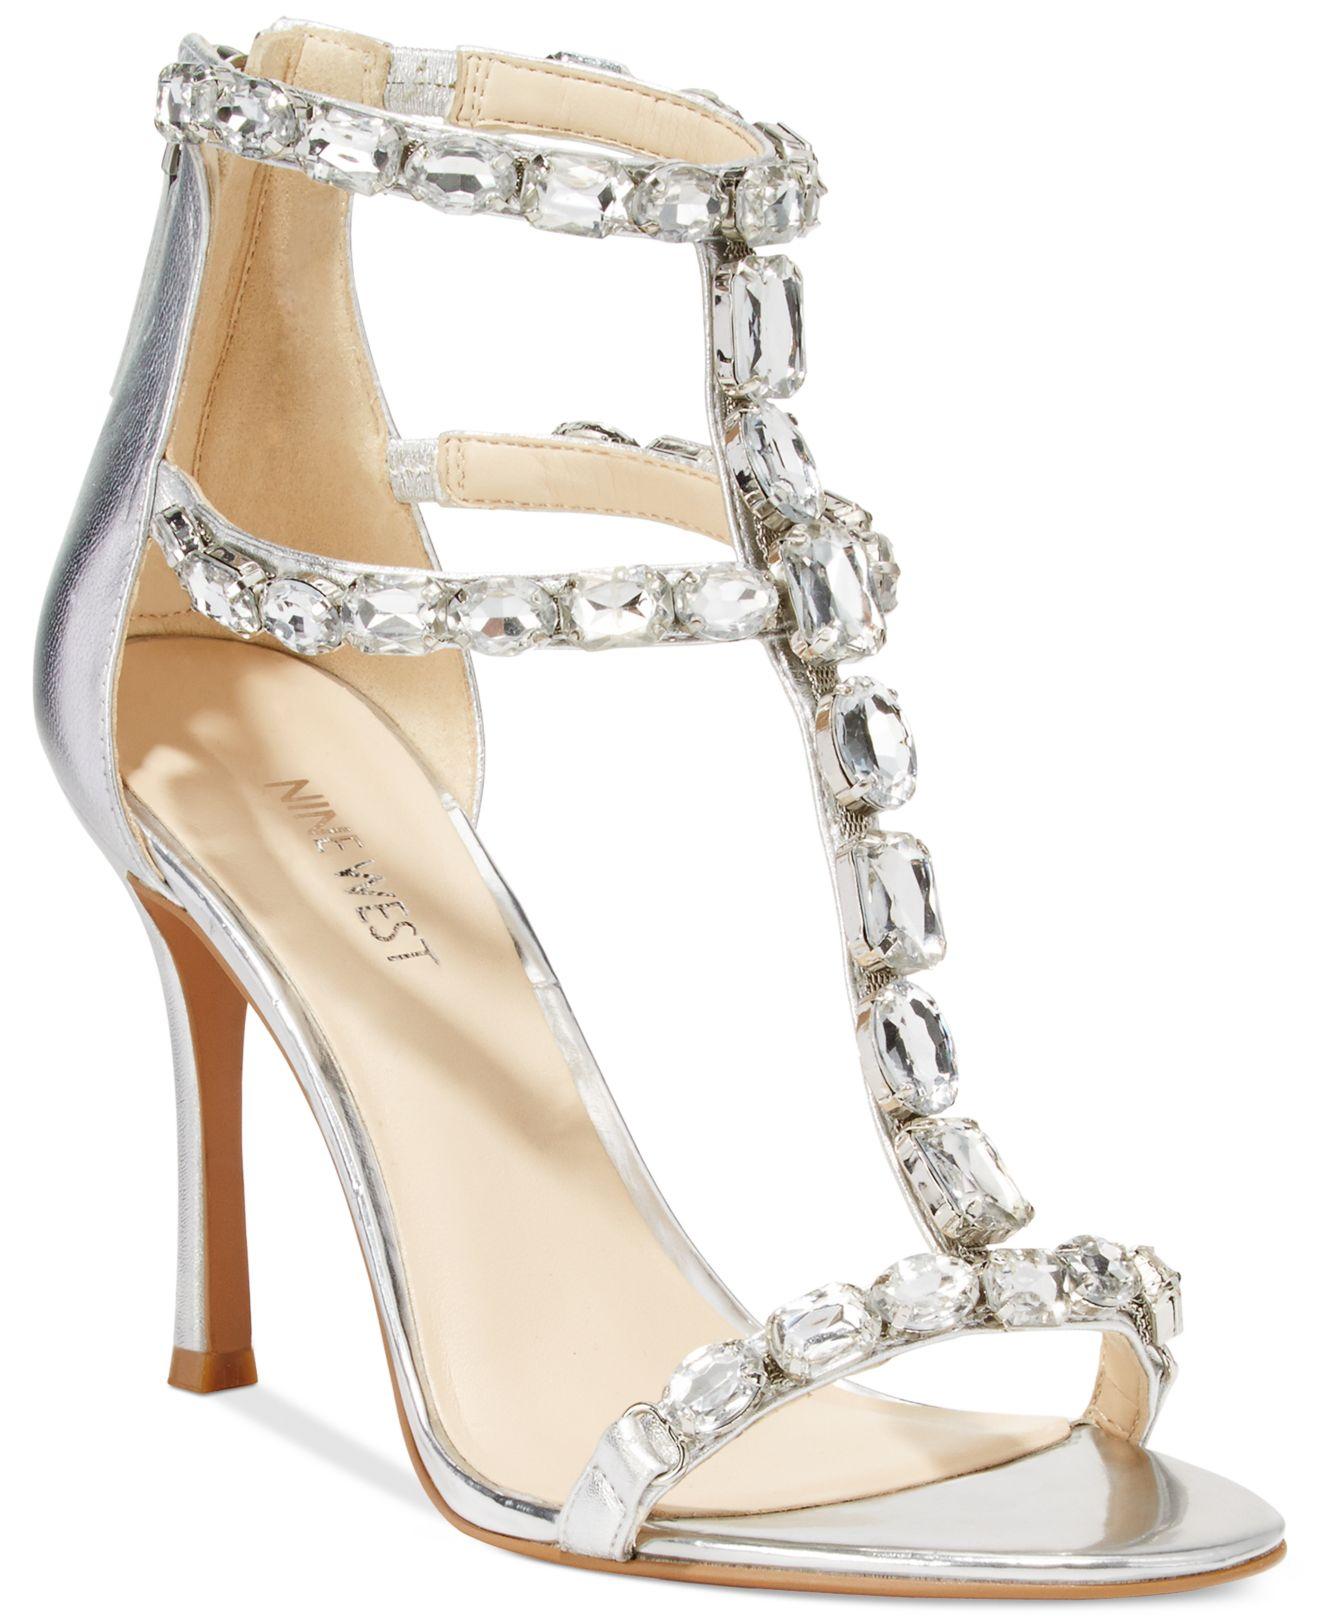 304f57f45c9 Lyst - Nine West Fresh3 Evening Sandals in Metallic